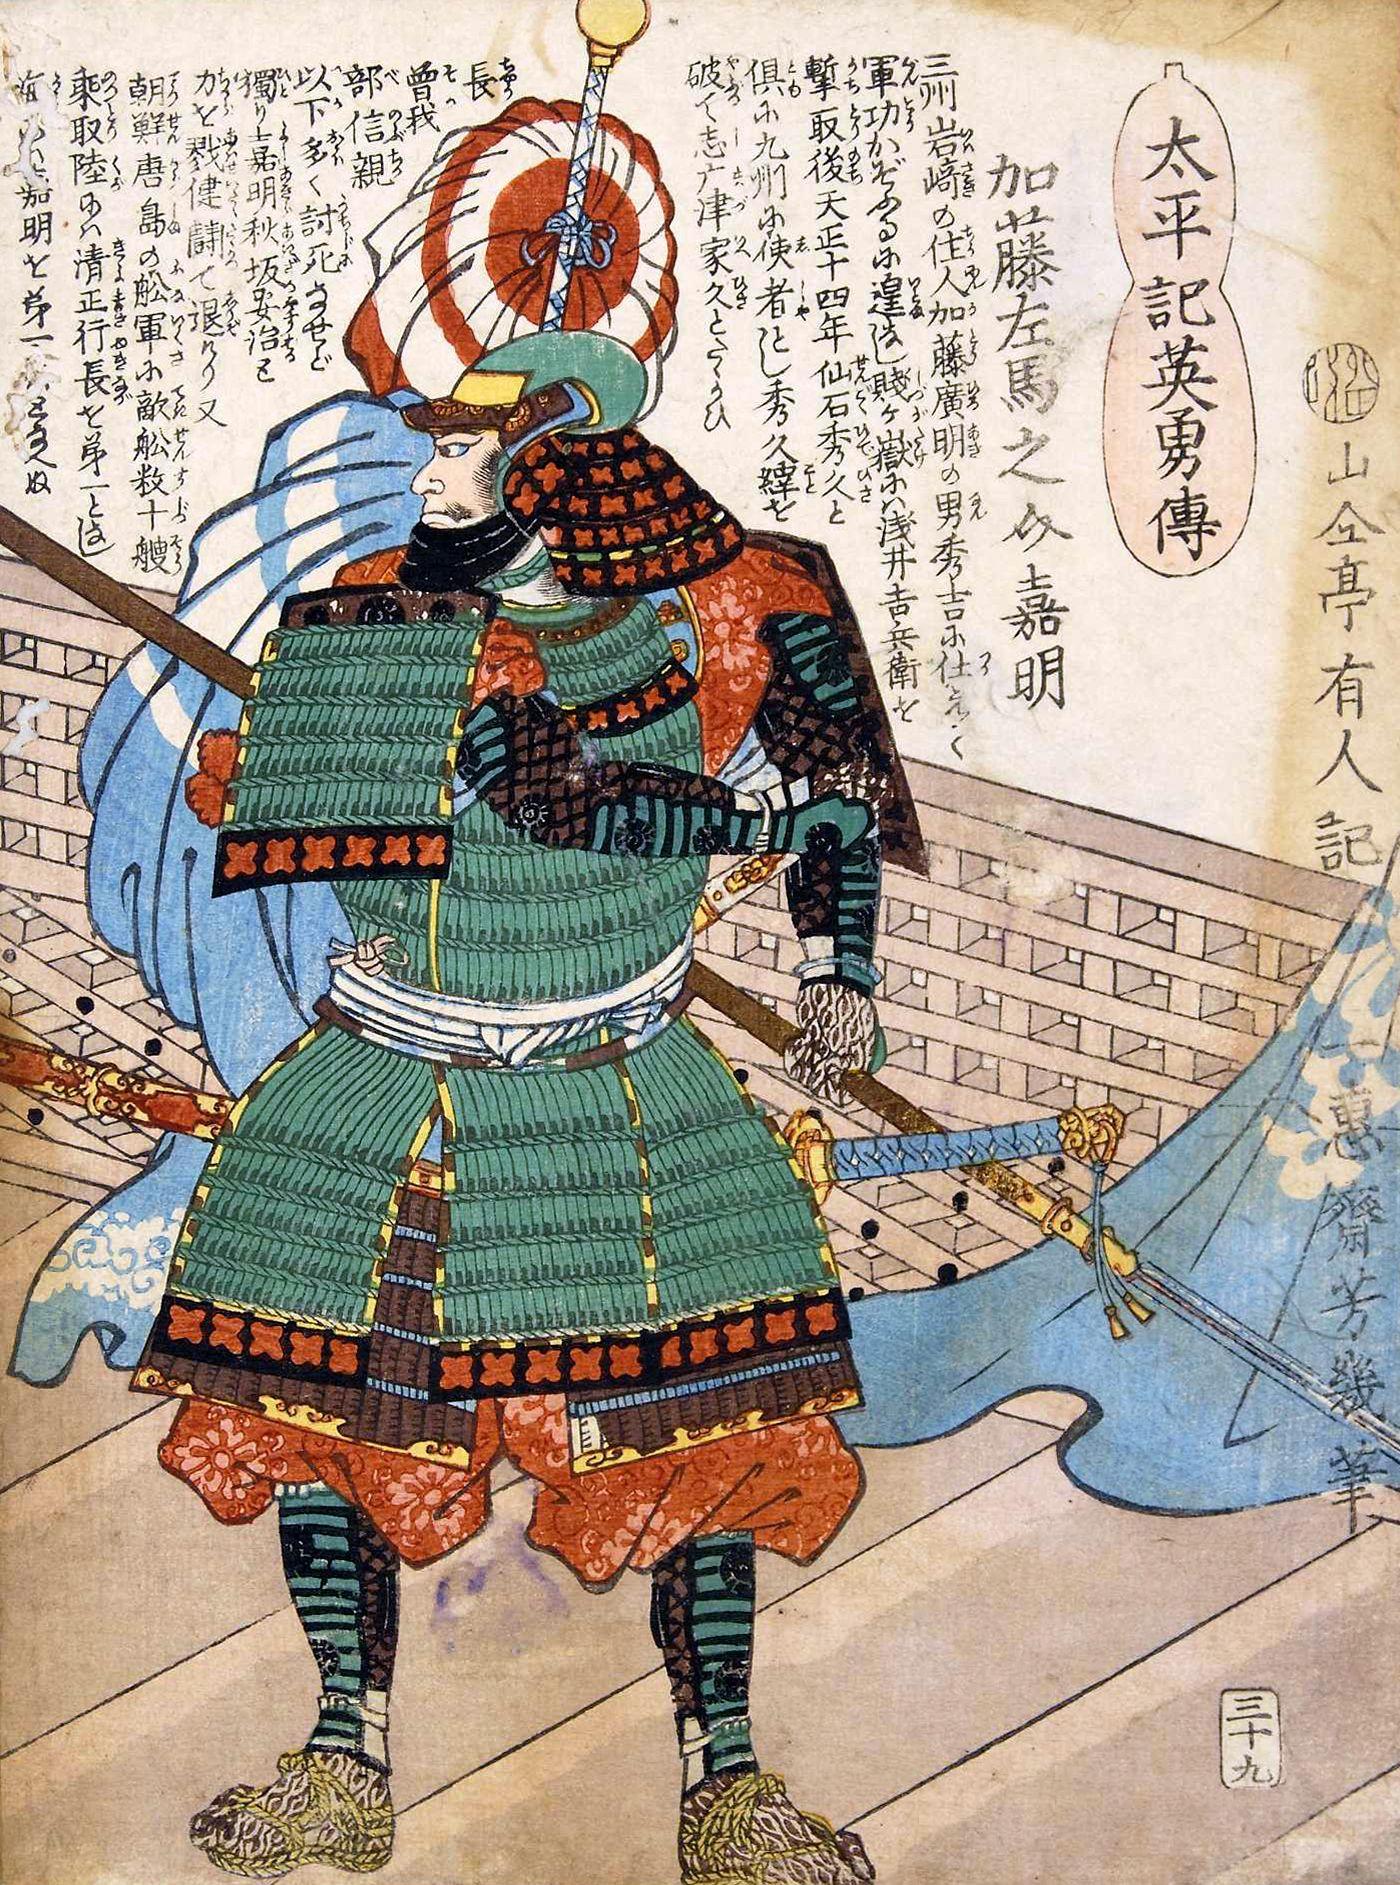 Kato Samasuke